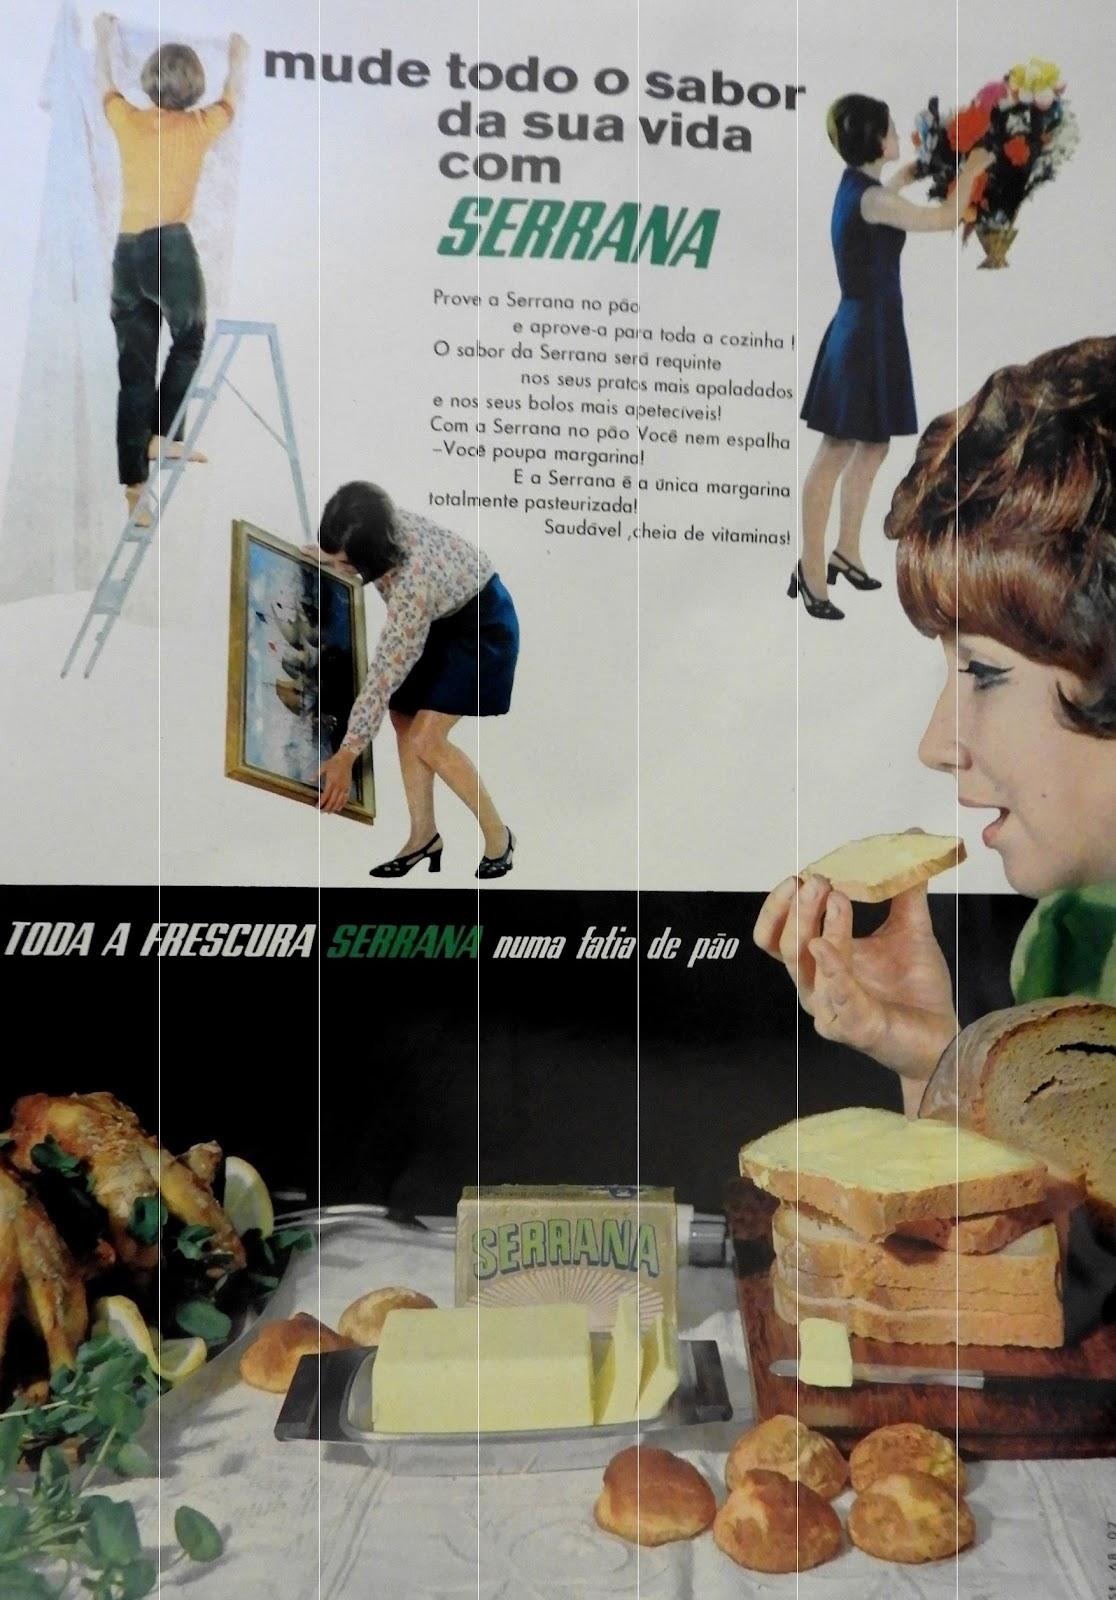 [margarina_serrana_sn%5B4%5D]